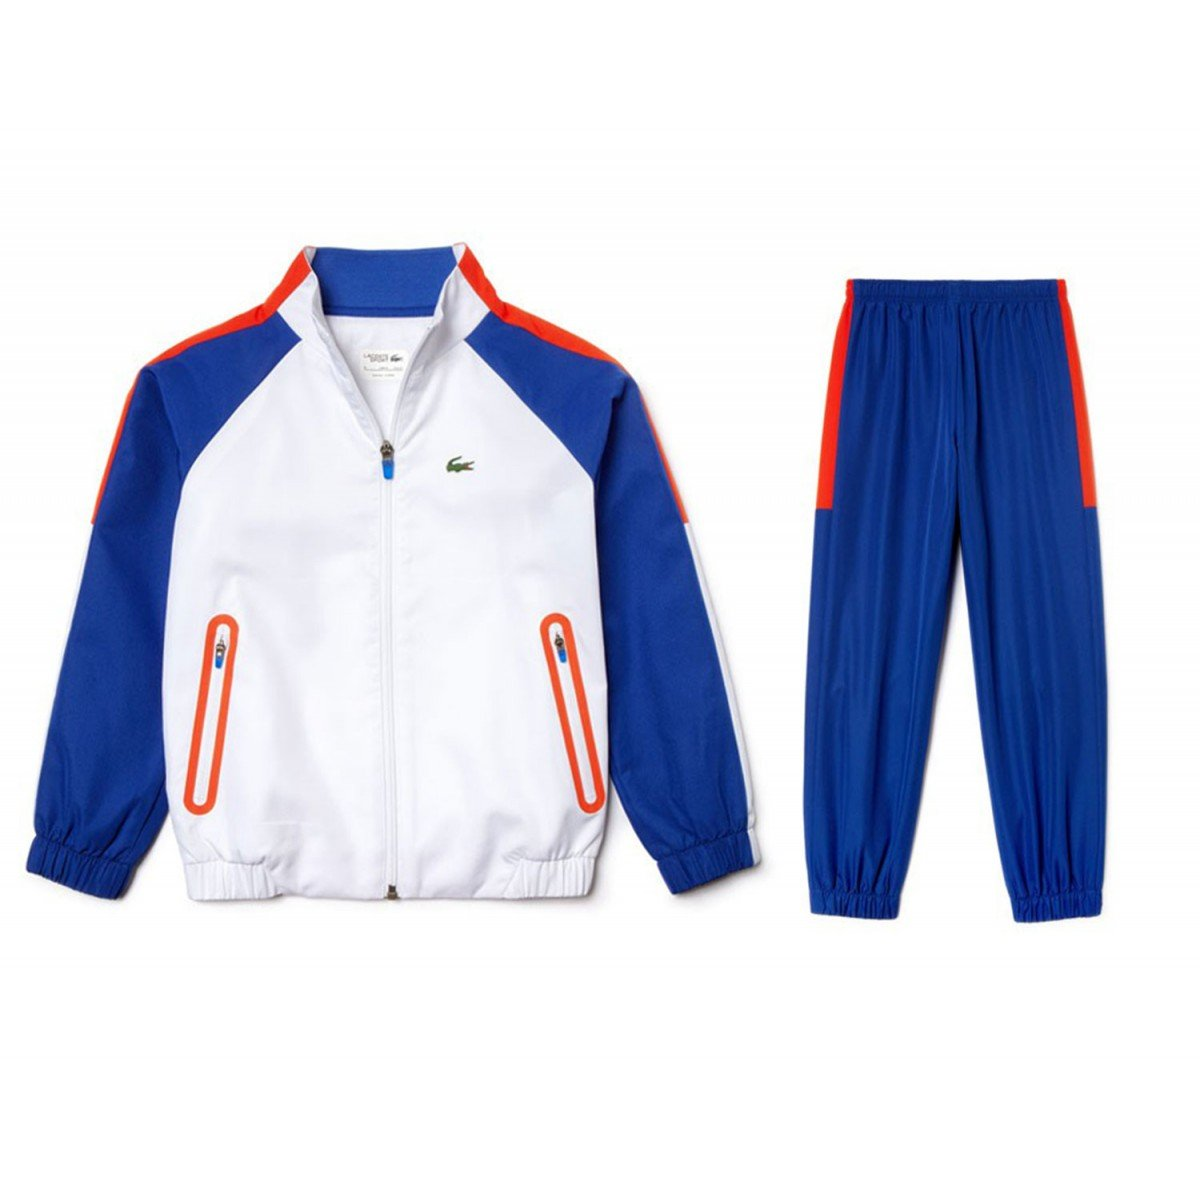 04e219aceadf36 Lacoste Taffeta Color Block Tracksuit for Children (White) - 158   Amazon.co.uk  Sports   Outdoors